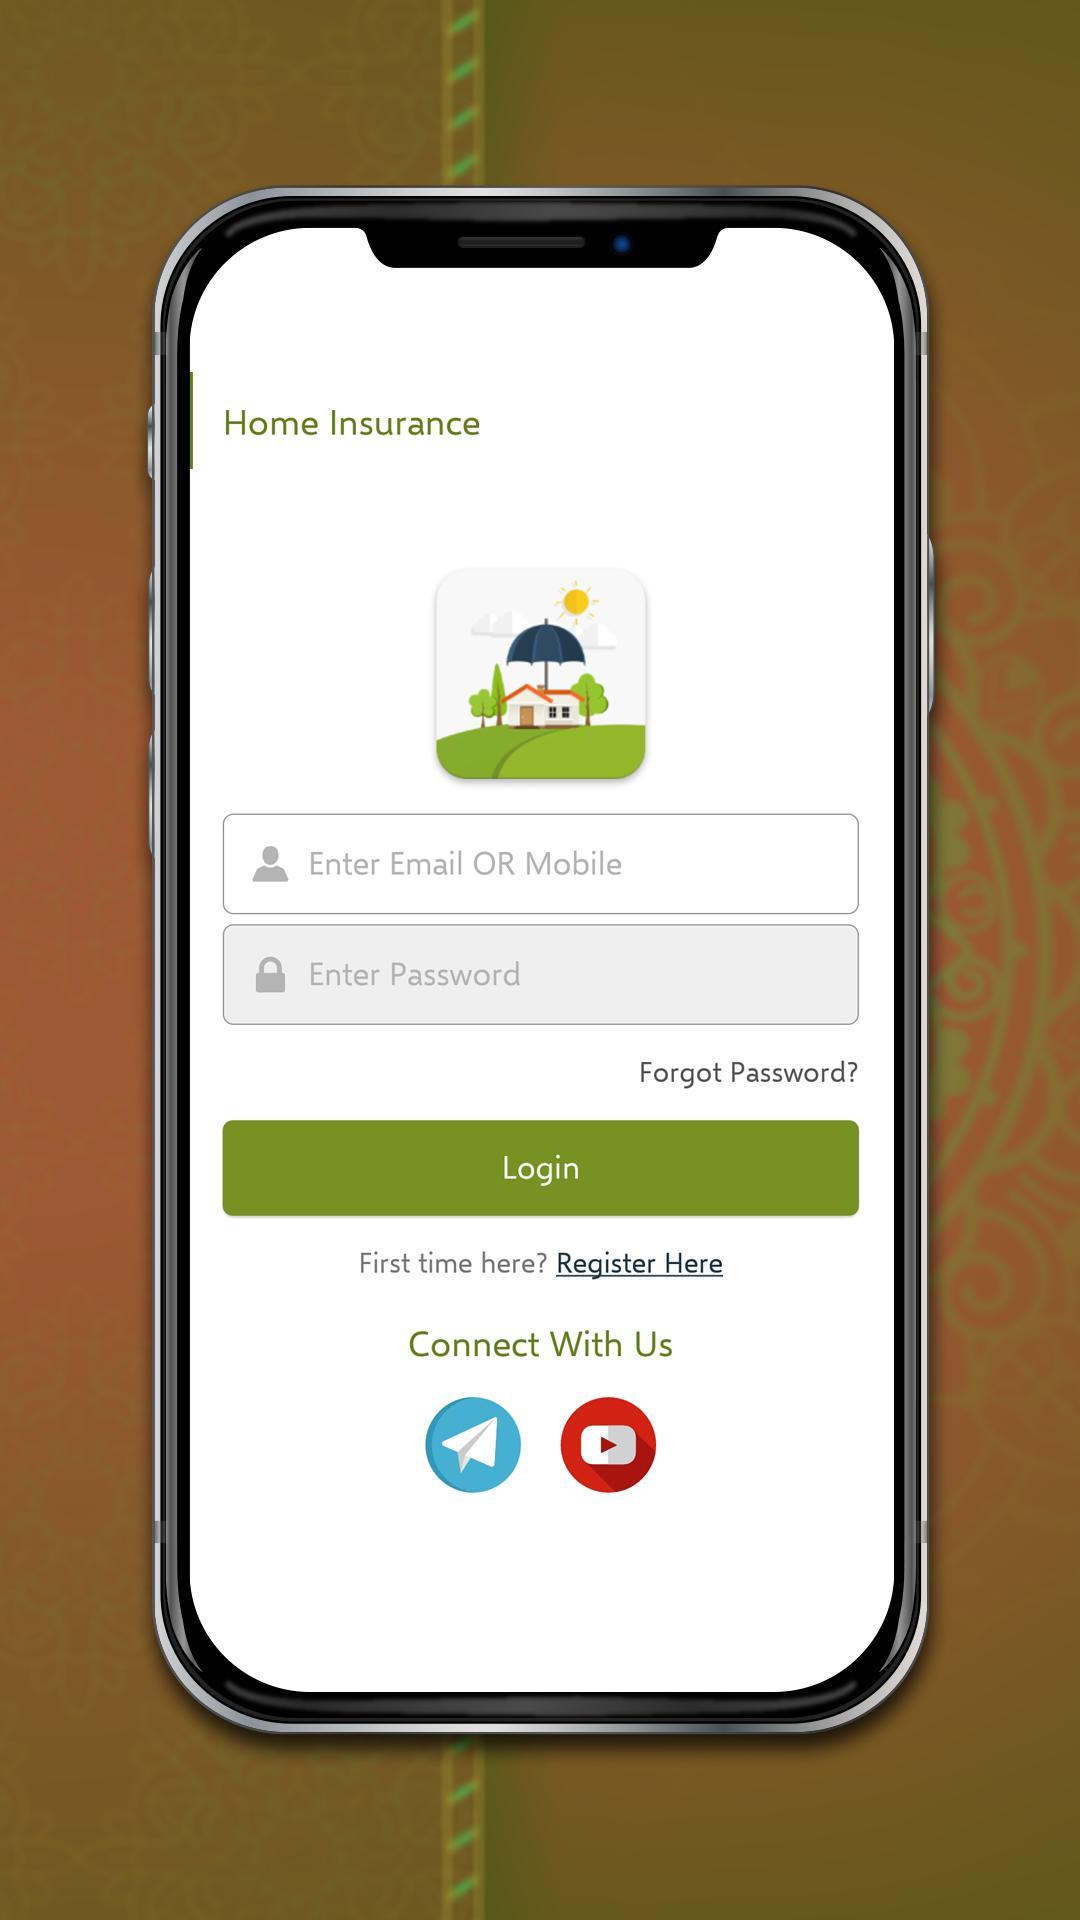 Home Insurance Apk Download – Home Insurance Apk App – Home Insurance Apk Client New 2021* 1